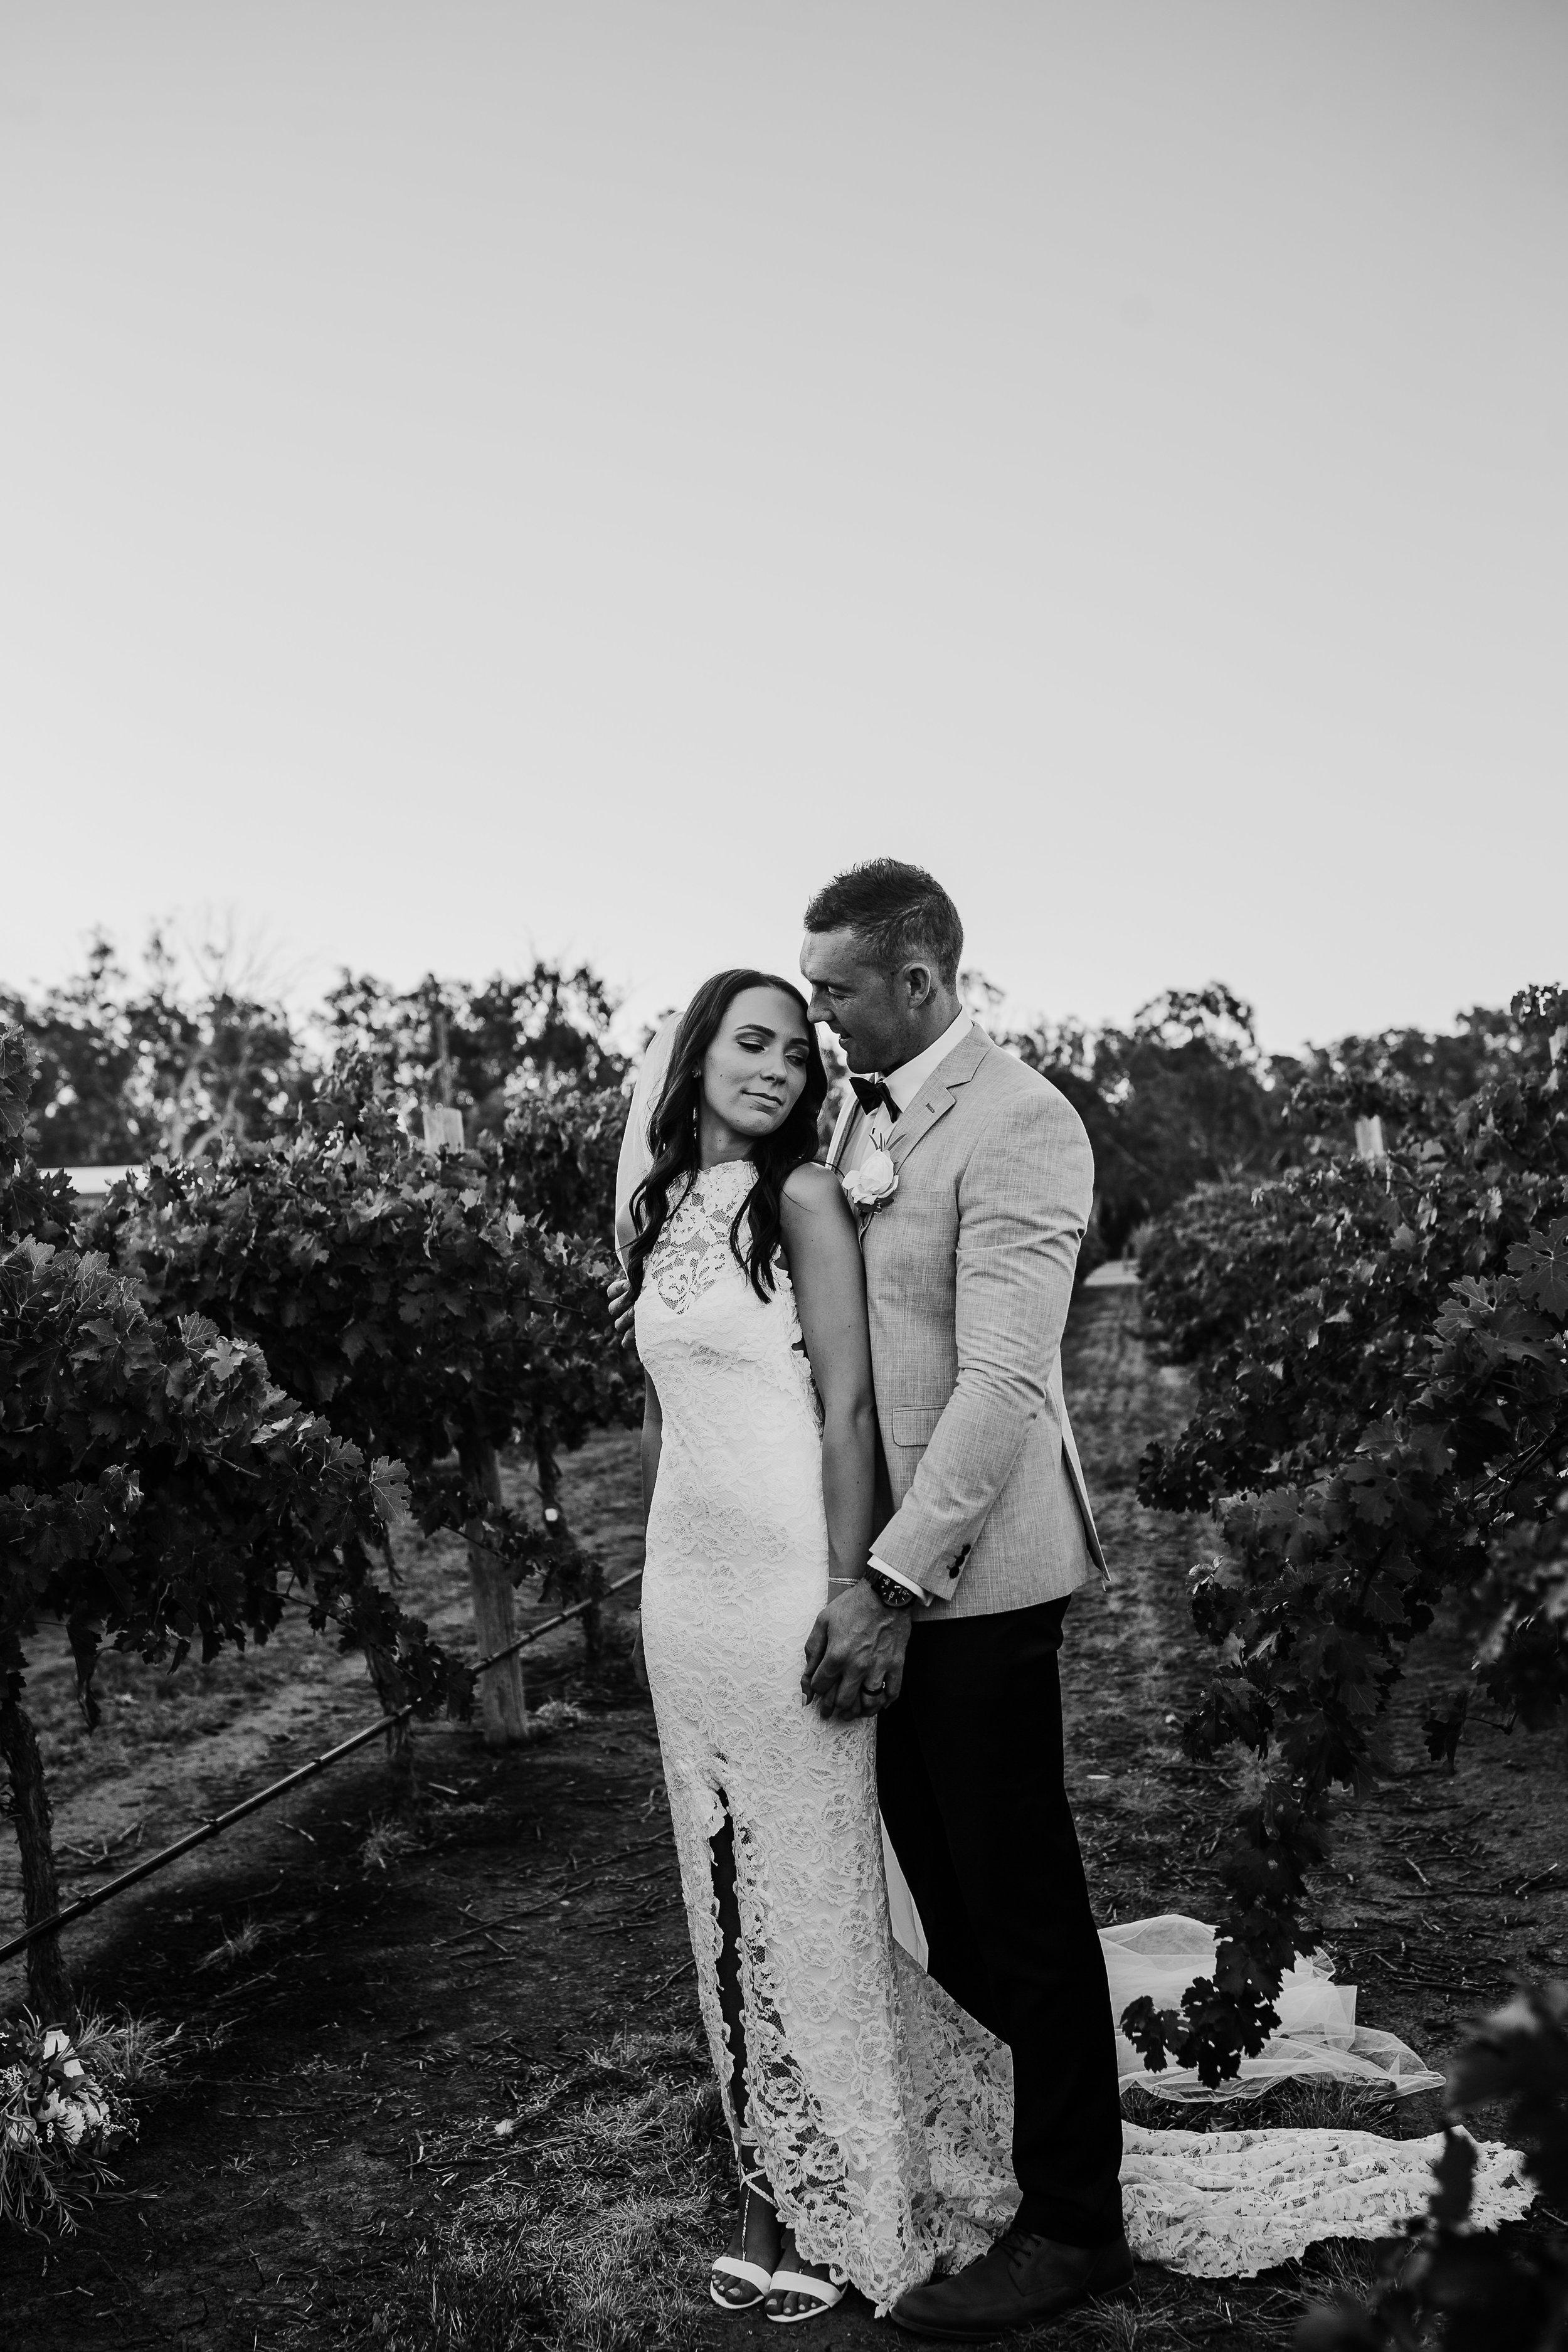 mickalathomas_puremacphotography_weddingphotographer_couplephotographer_Sheppartonphotographer_2914.jpg